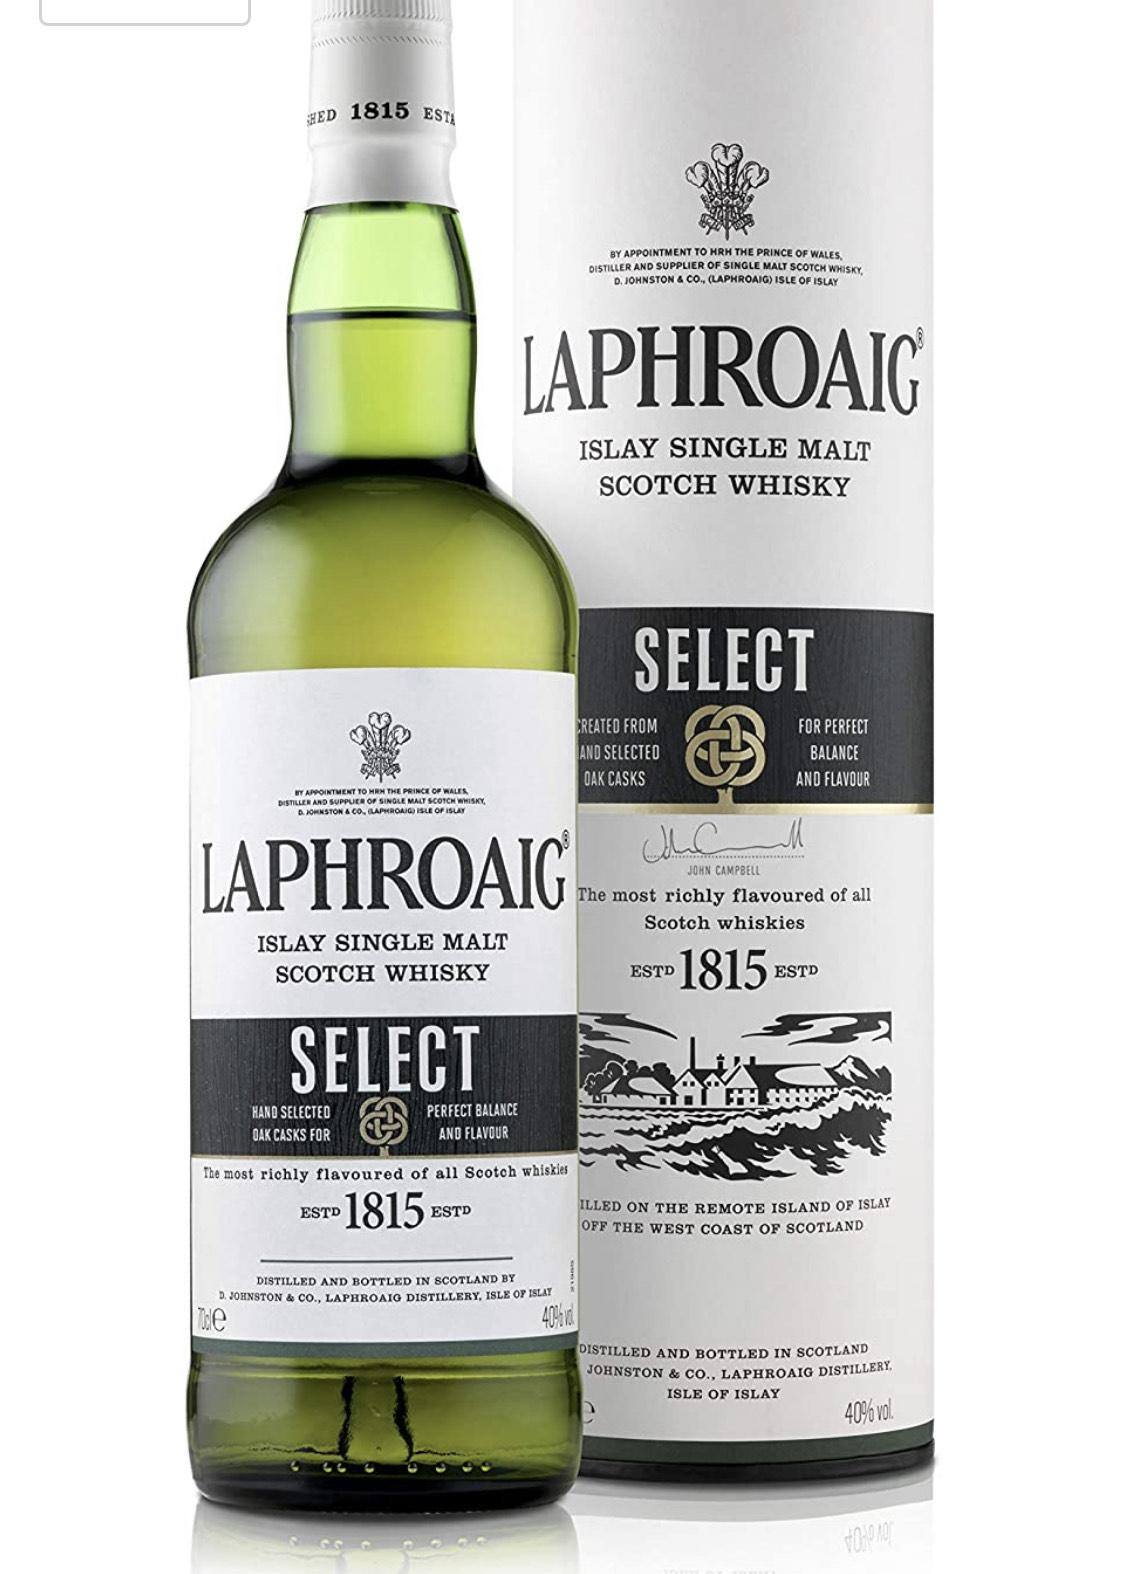 Laphroaig Select Islay Single Malt Scotch Whisky, 70 cl £25 at Amazon